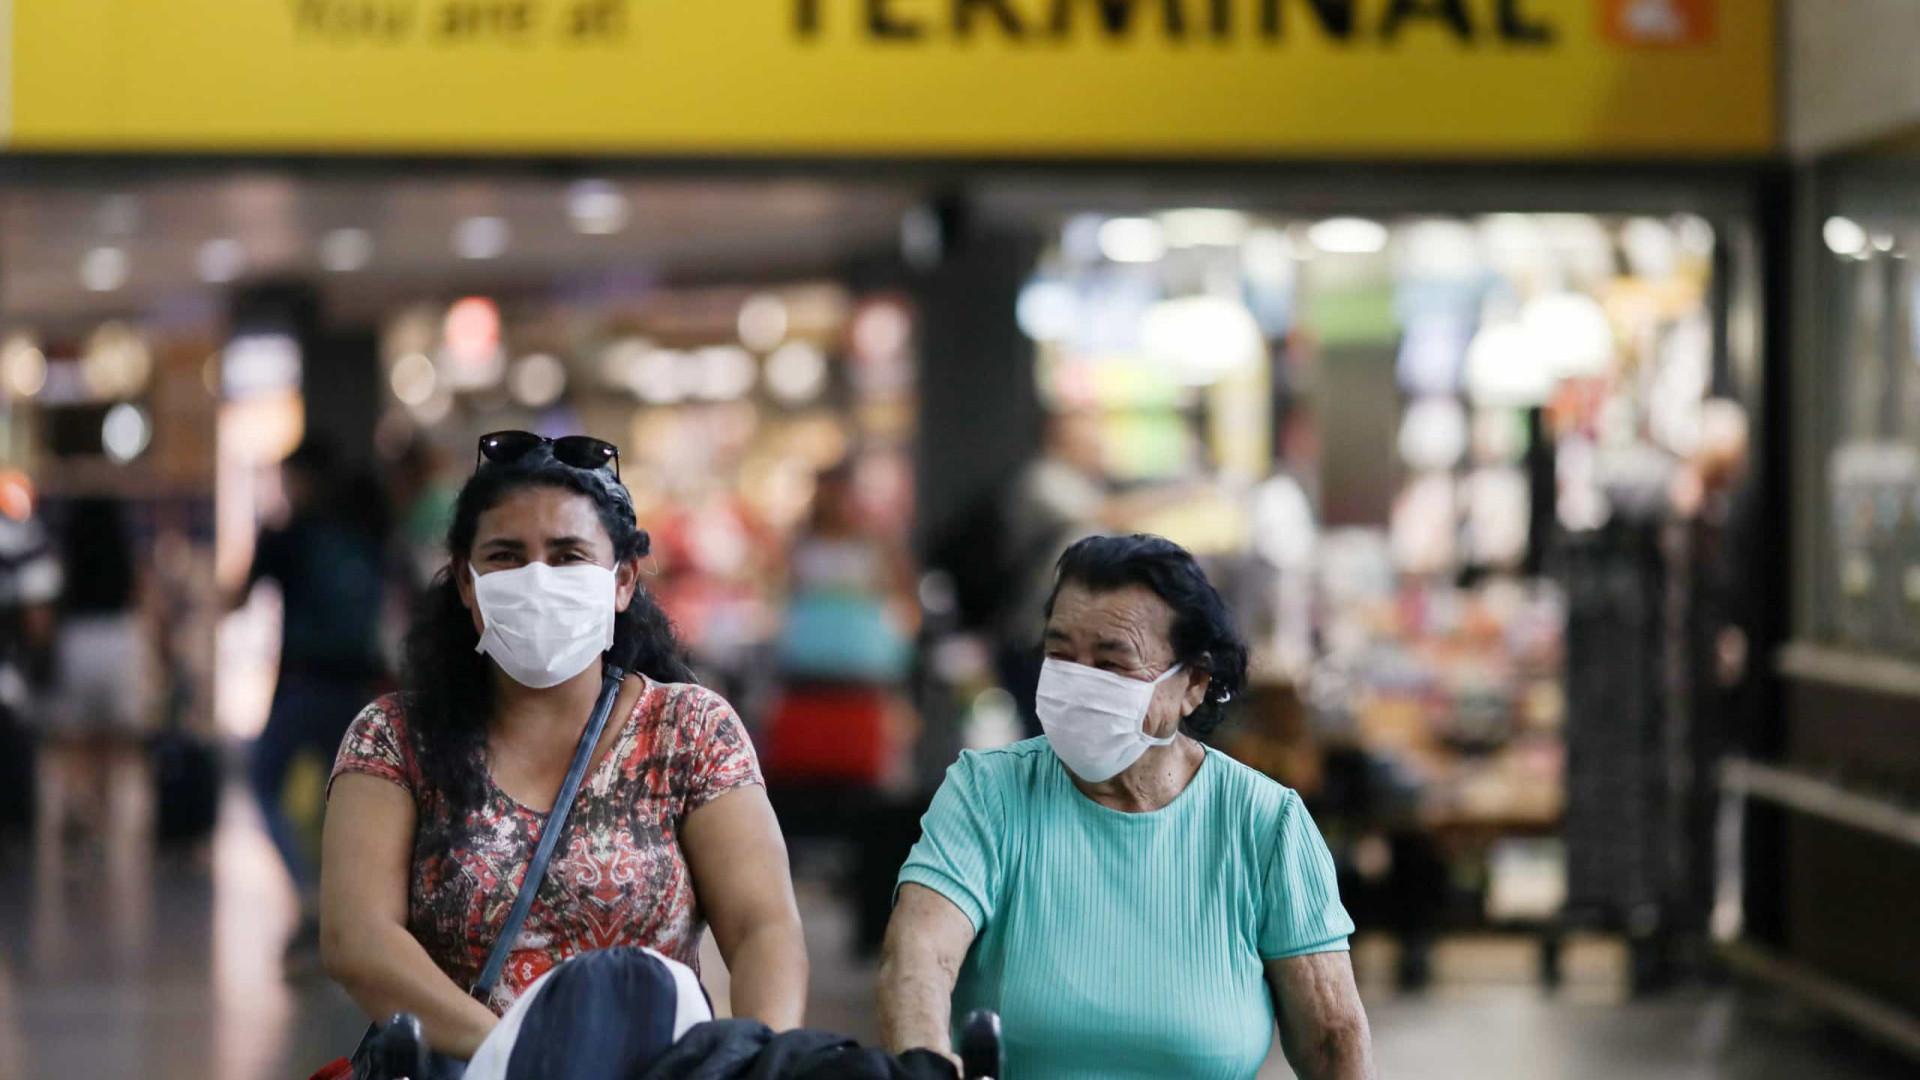 SP ultrapassa 600 mortes causada pelo novo coronavírus